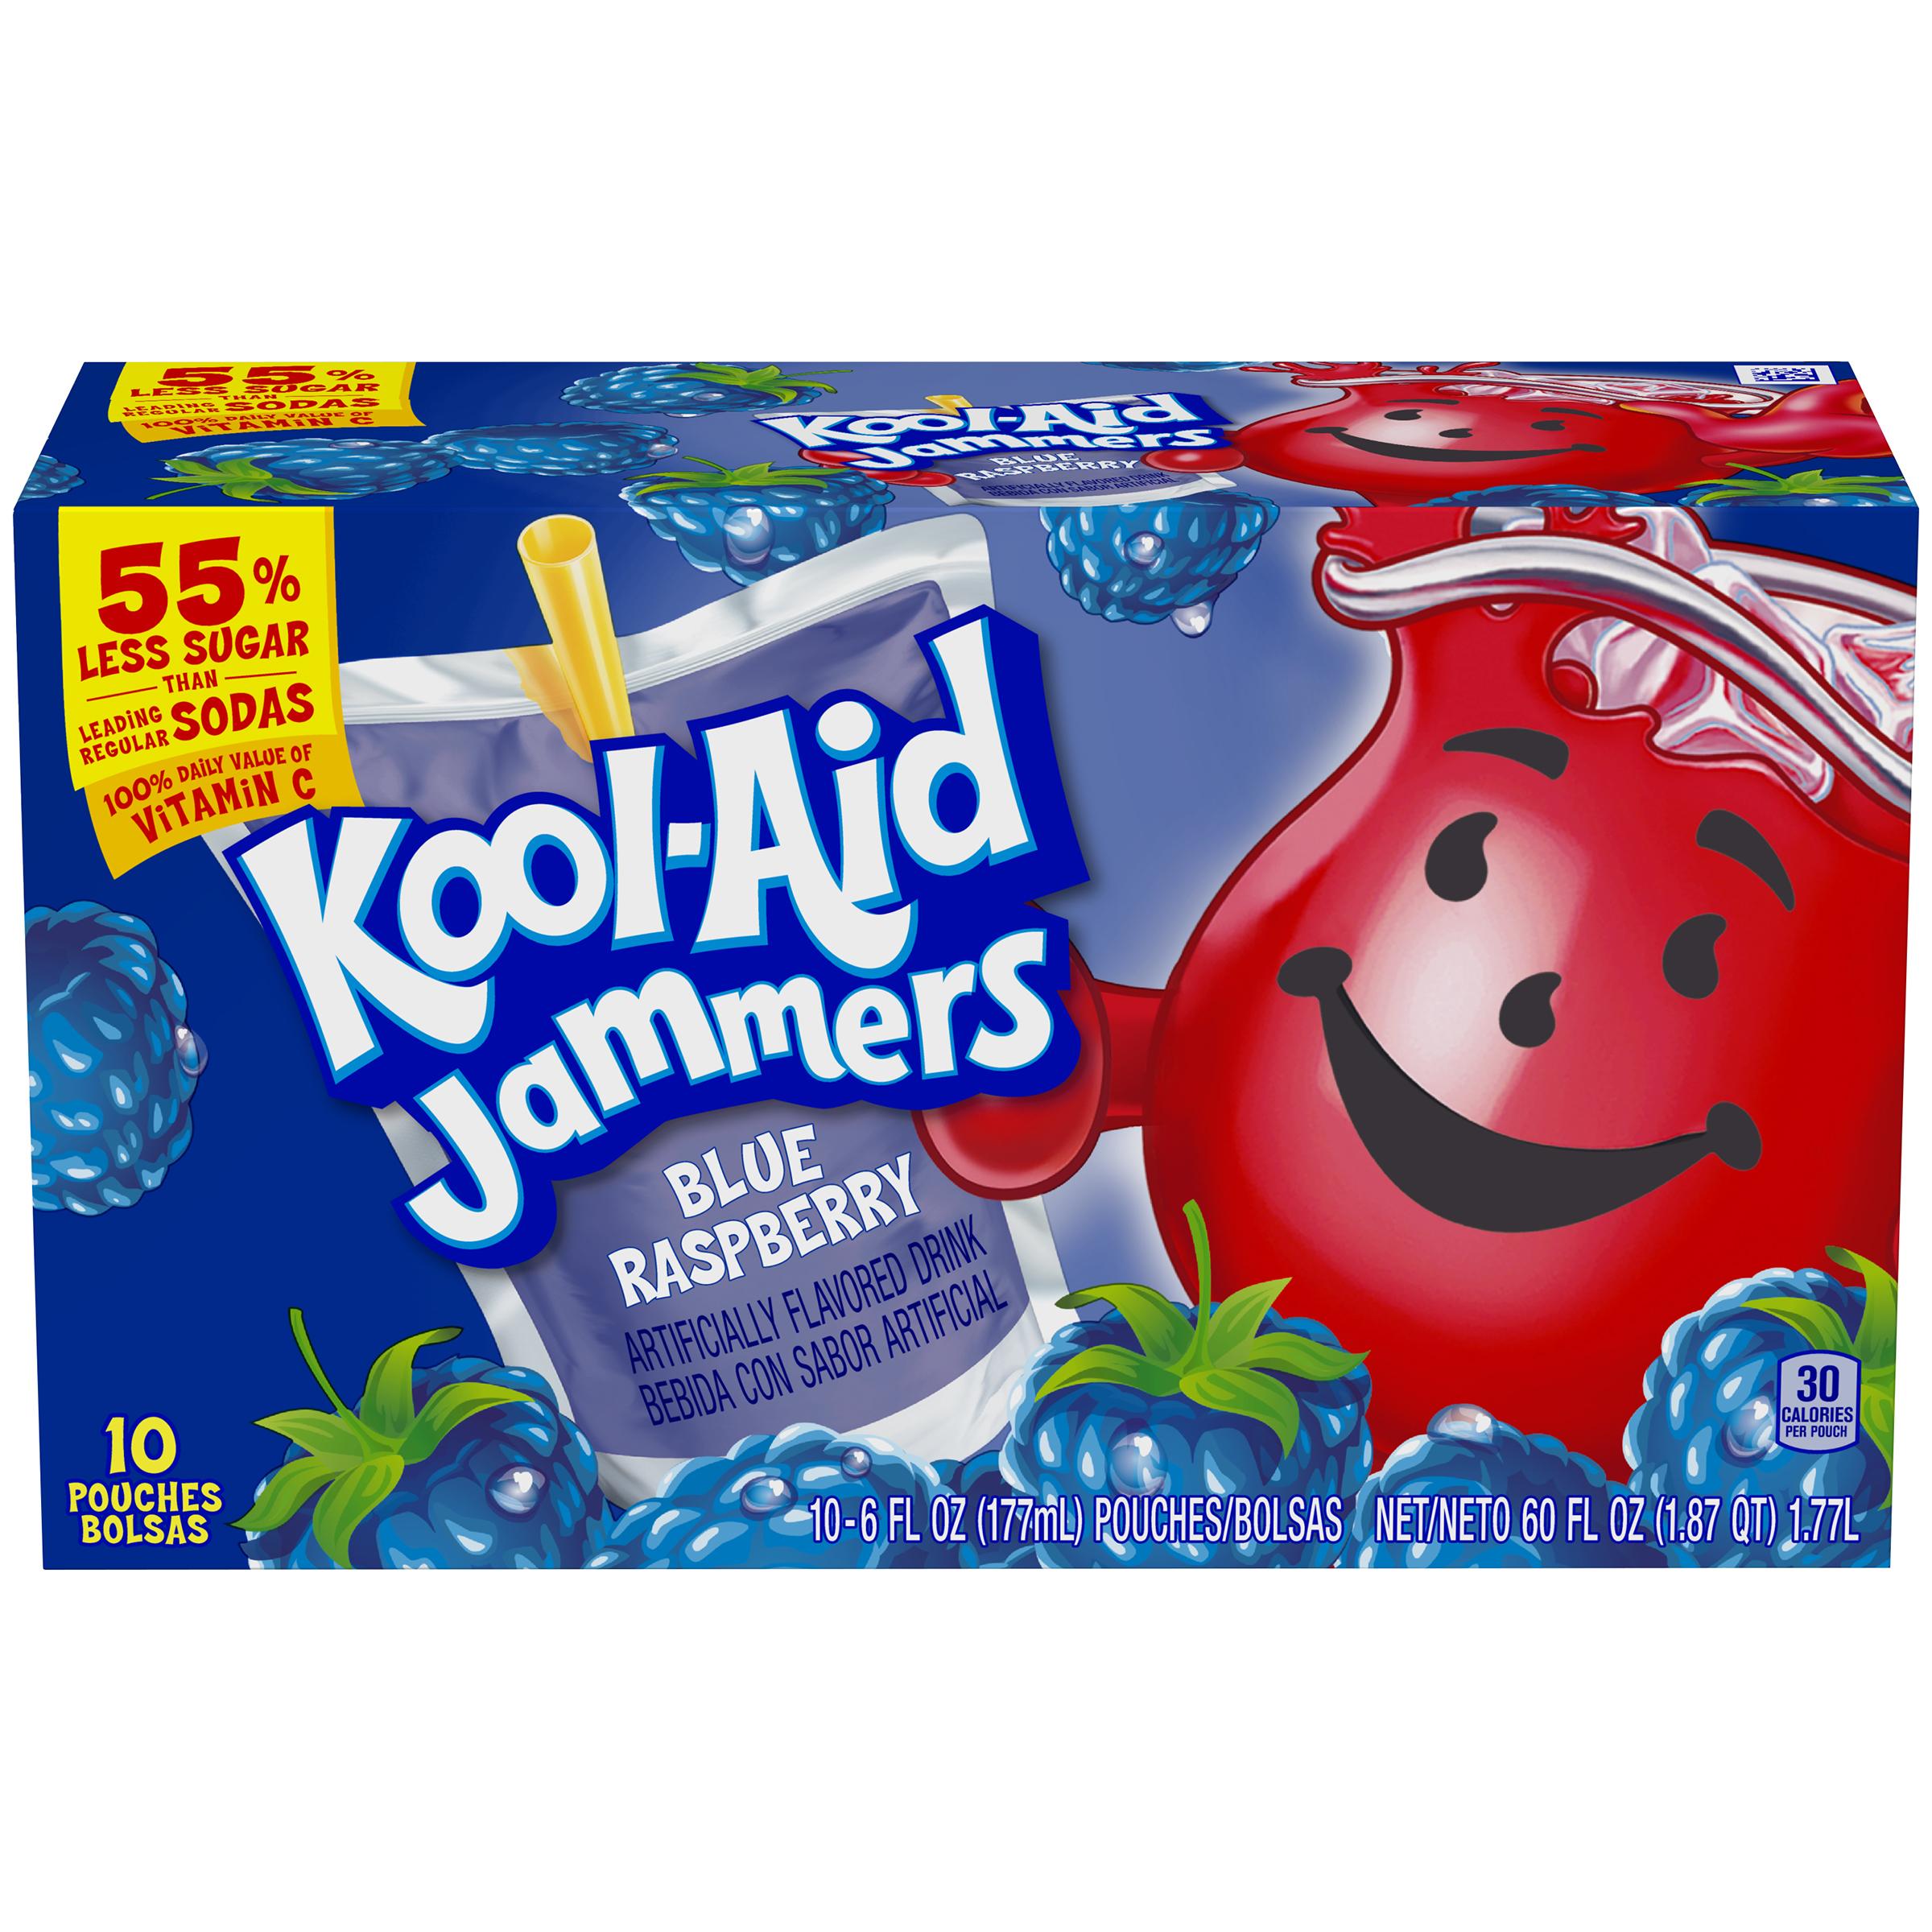 Kool-Aid Jammers Blue Raspberry Flavored Drink 60 fl oz Box (10-6 fl oz Pouches) image